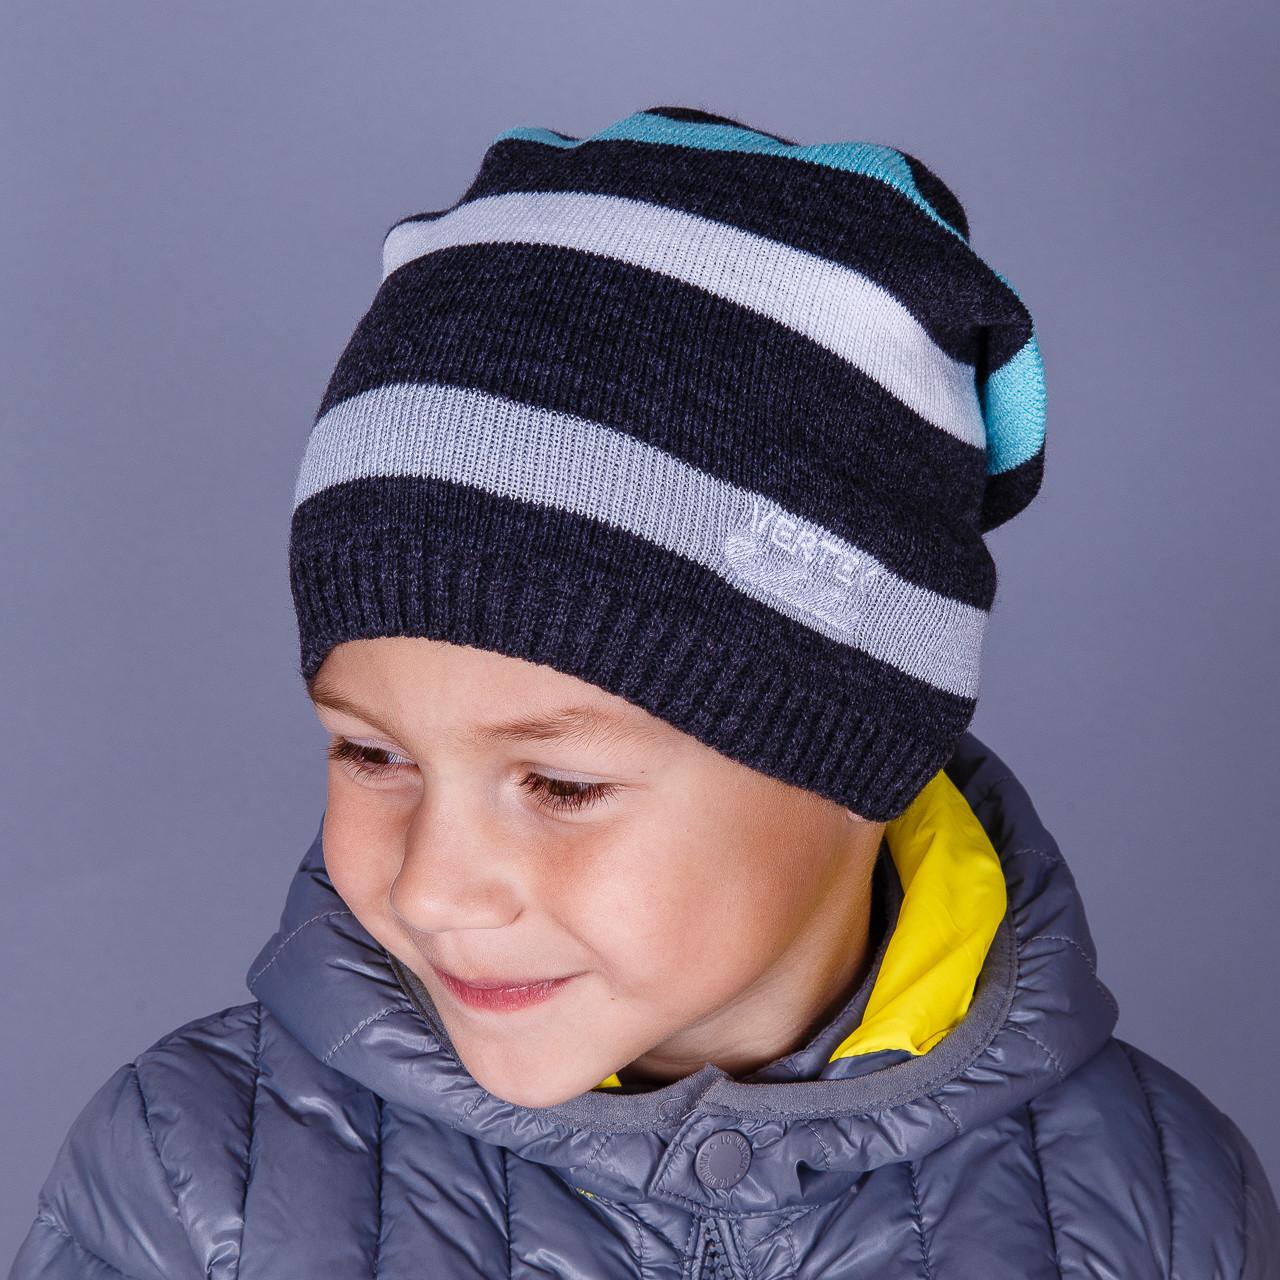 Брендовая вязаная шапка на мальчика оптом - VERTEX - весна-осень 2018 - Артикул 1515